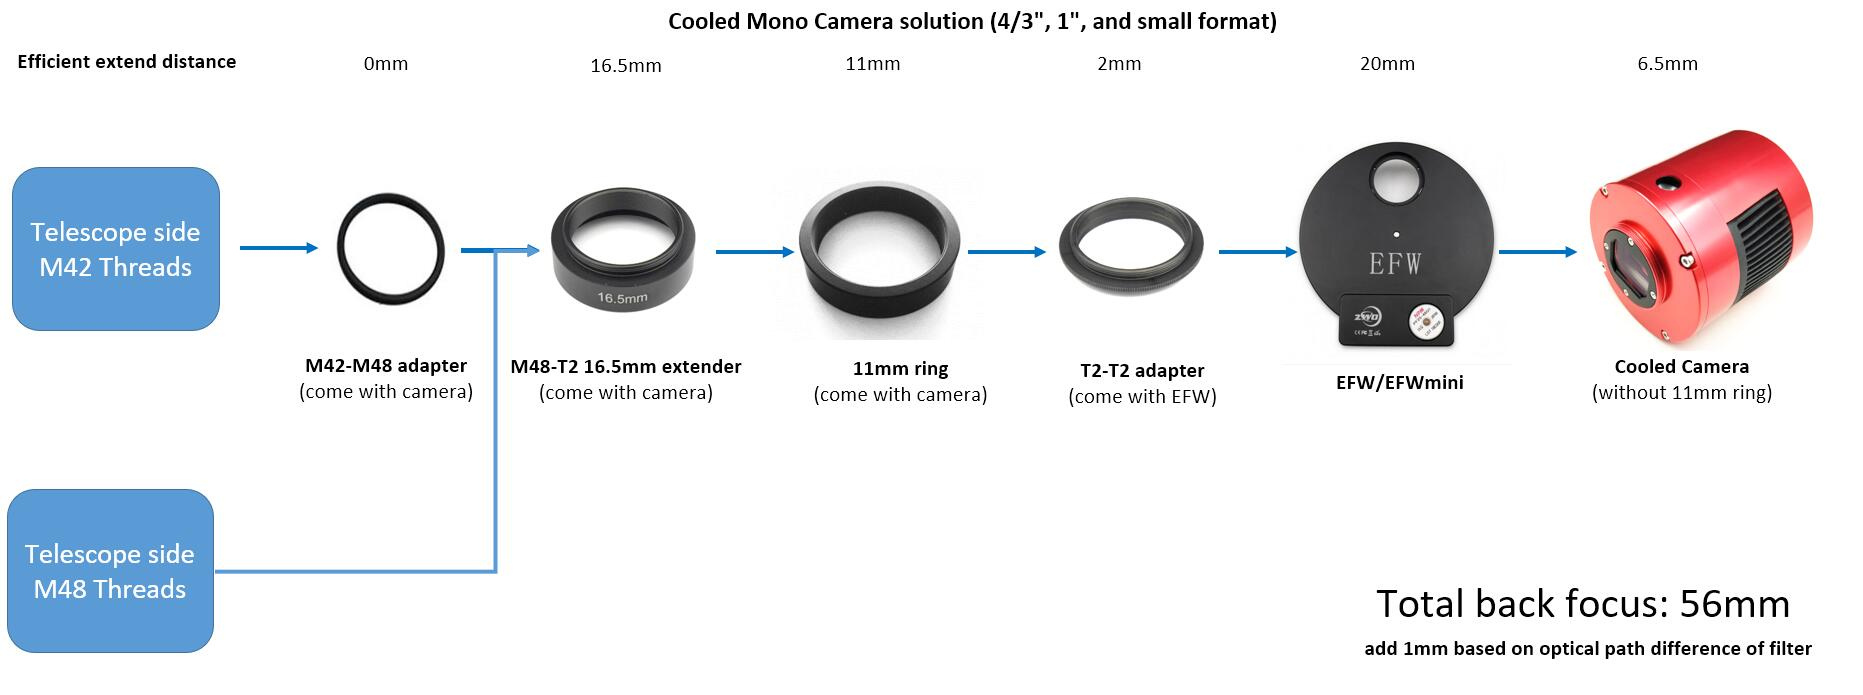 Cooled-Mono-Camera-solution.jpg